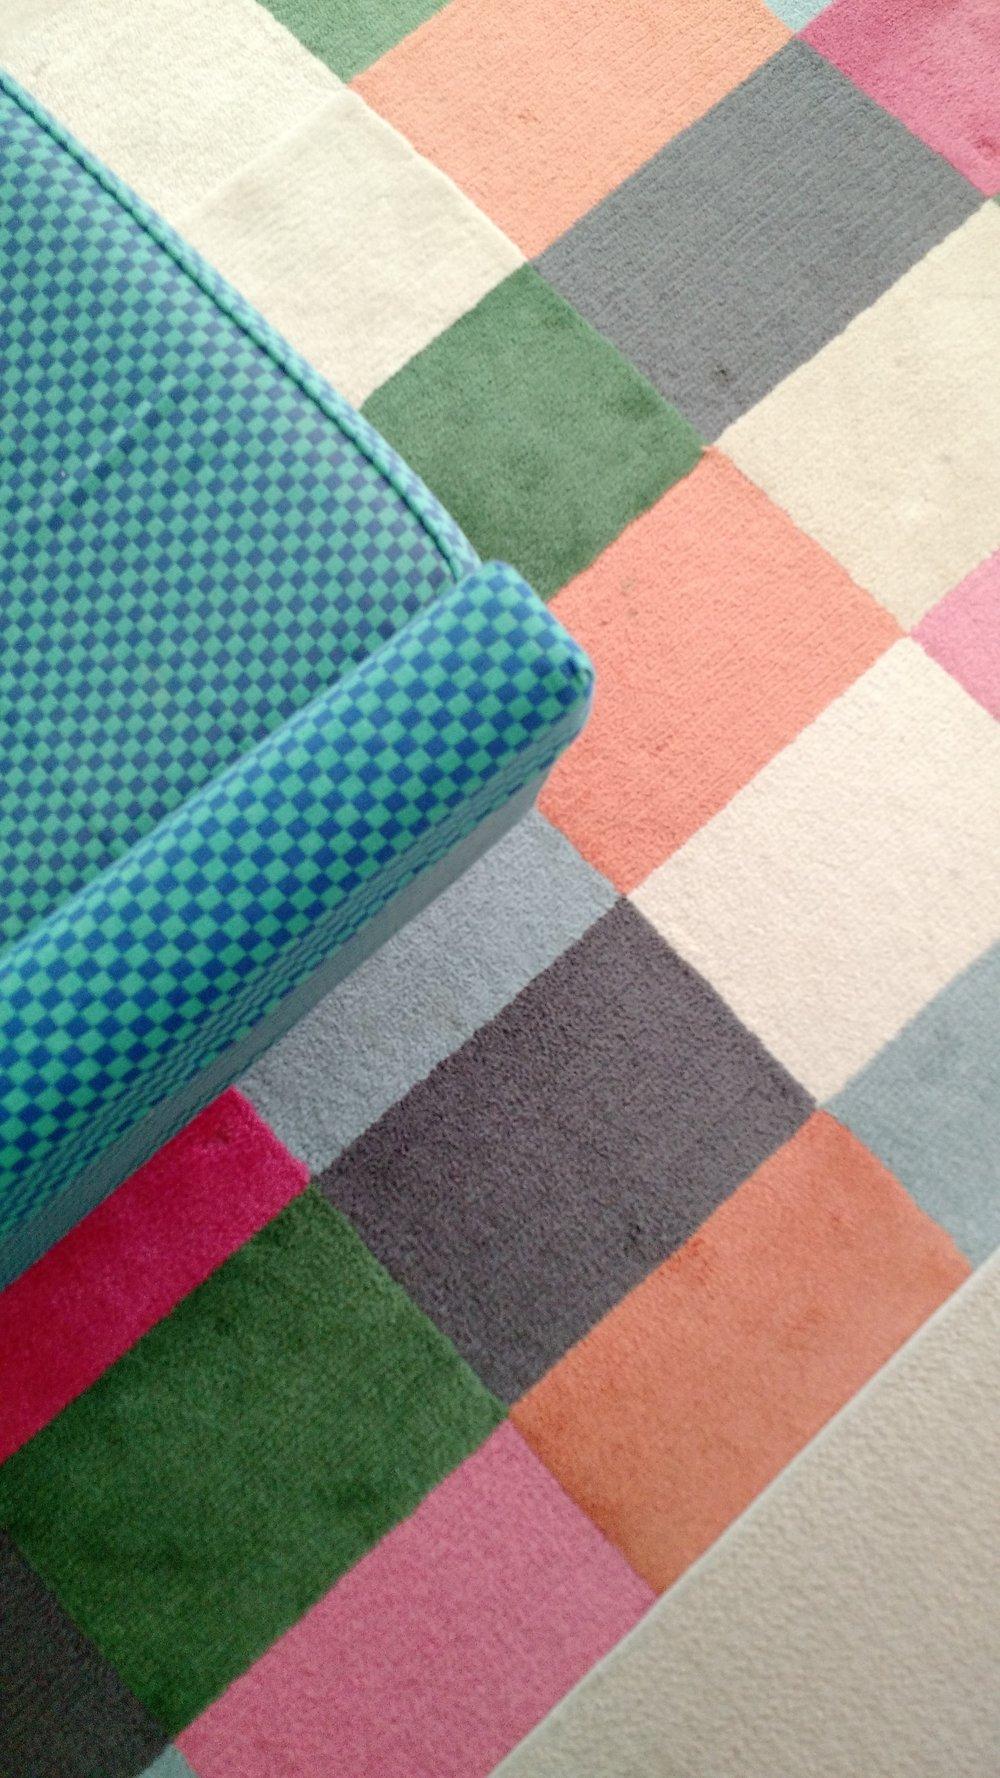 Miller House Custome Sofa and Carpet.jpg